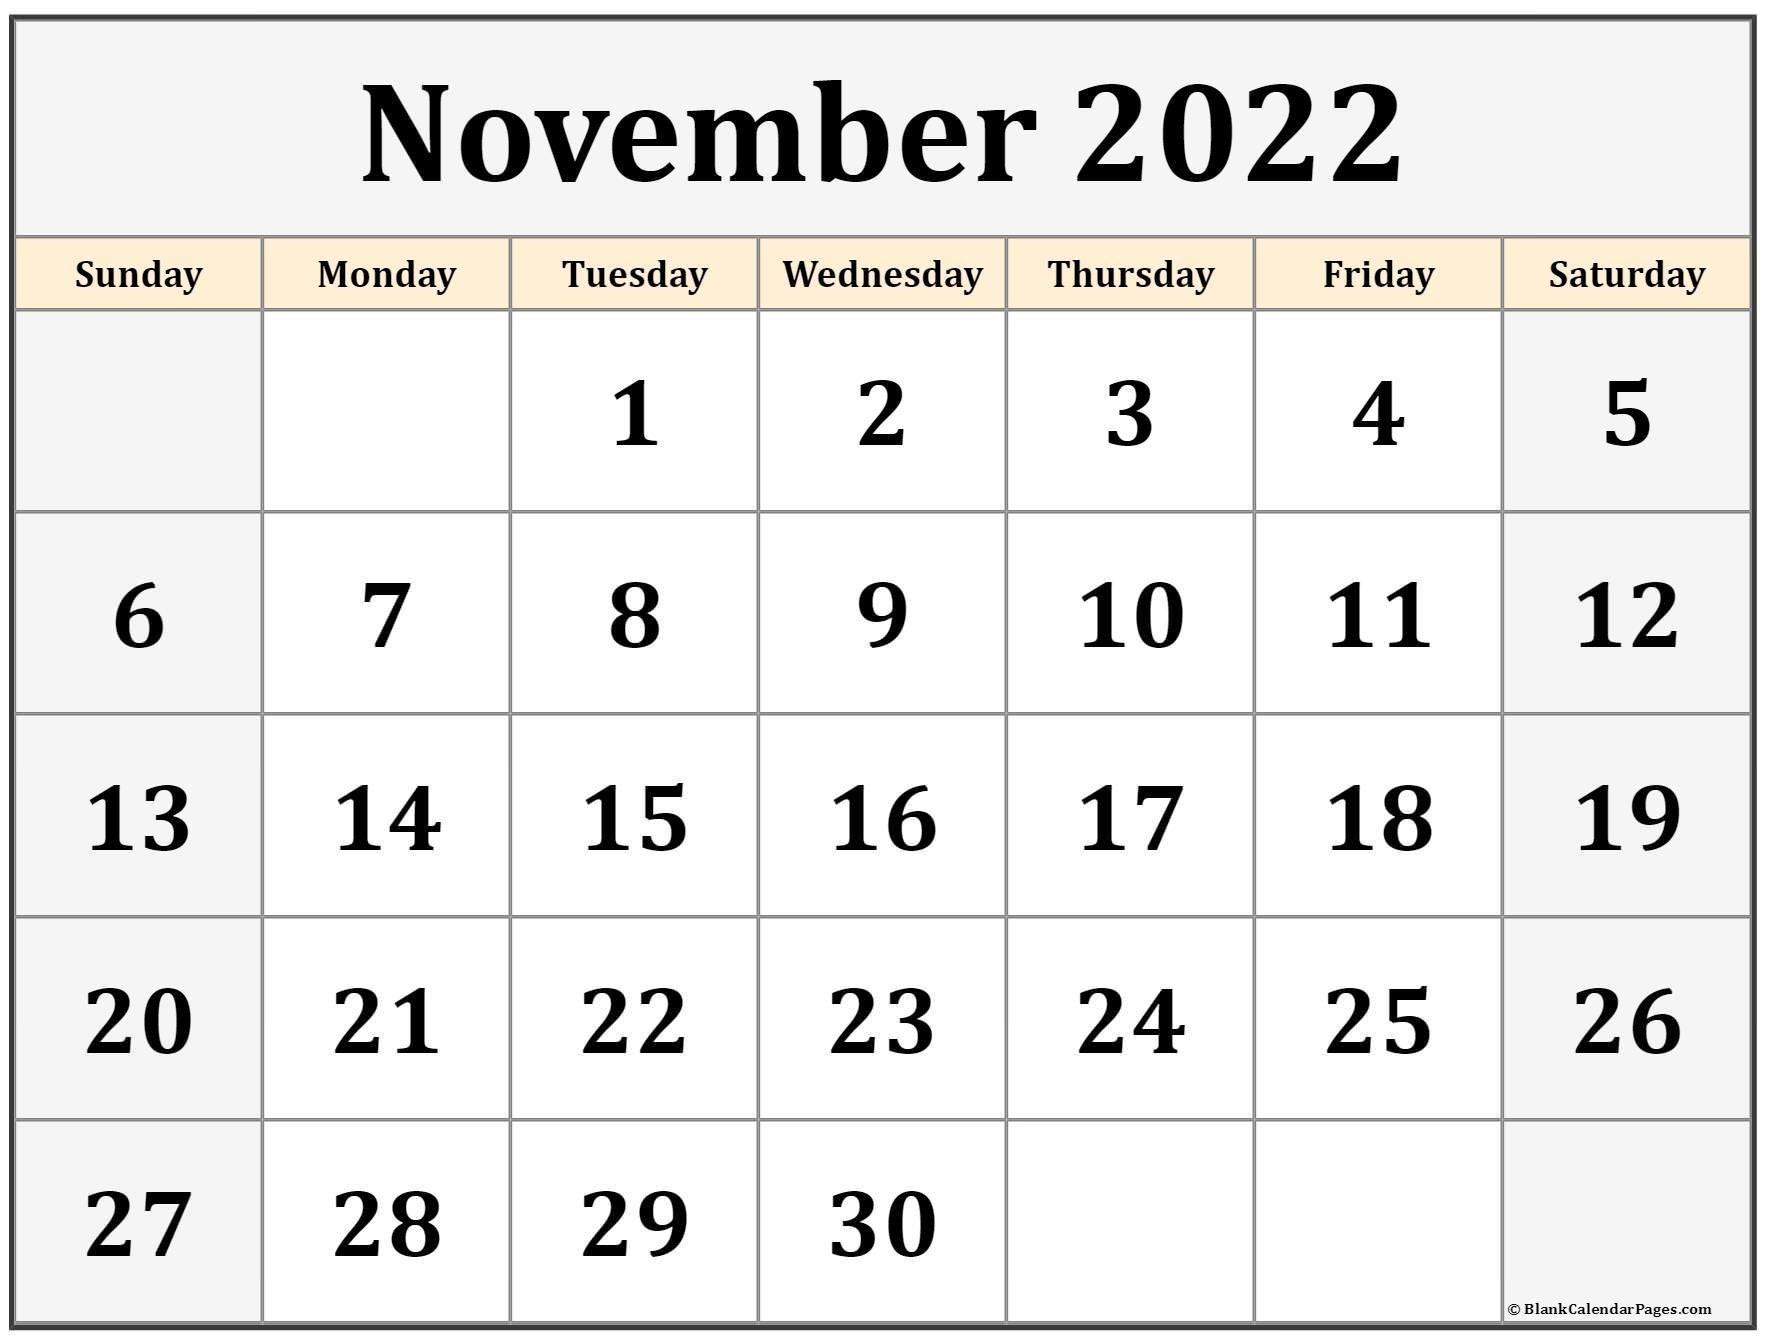 Printable Monthly Calendar November 2022.November 2022 Calendar Free Printable Calendar Templates